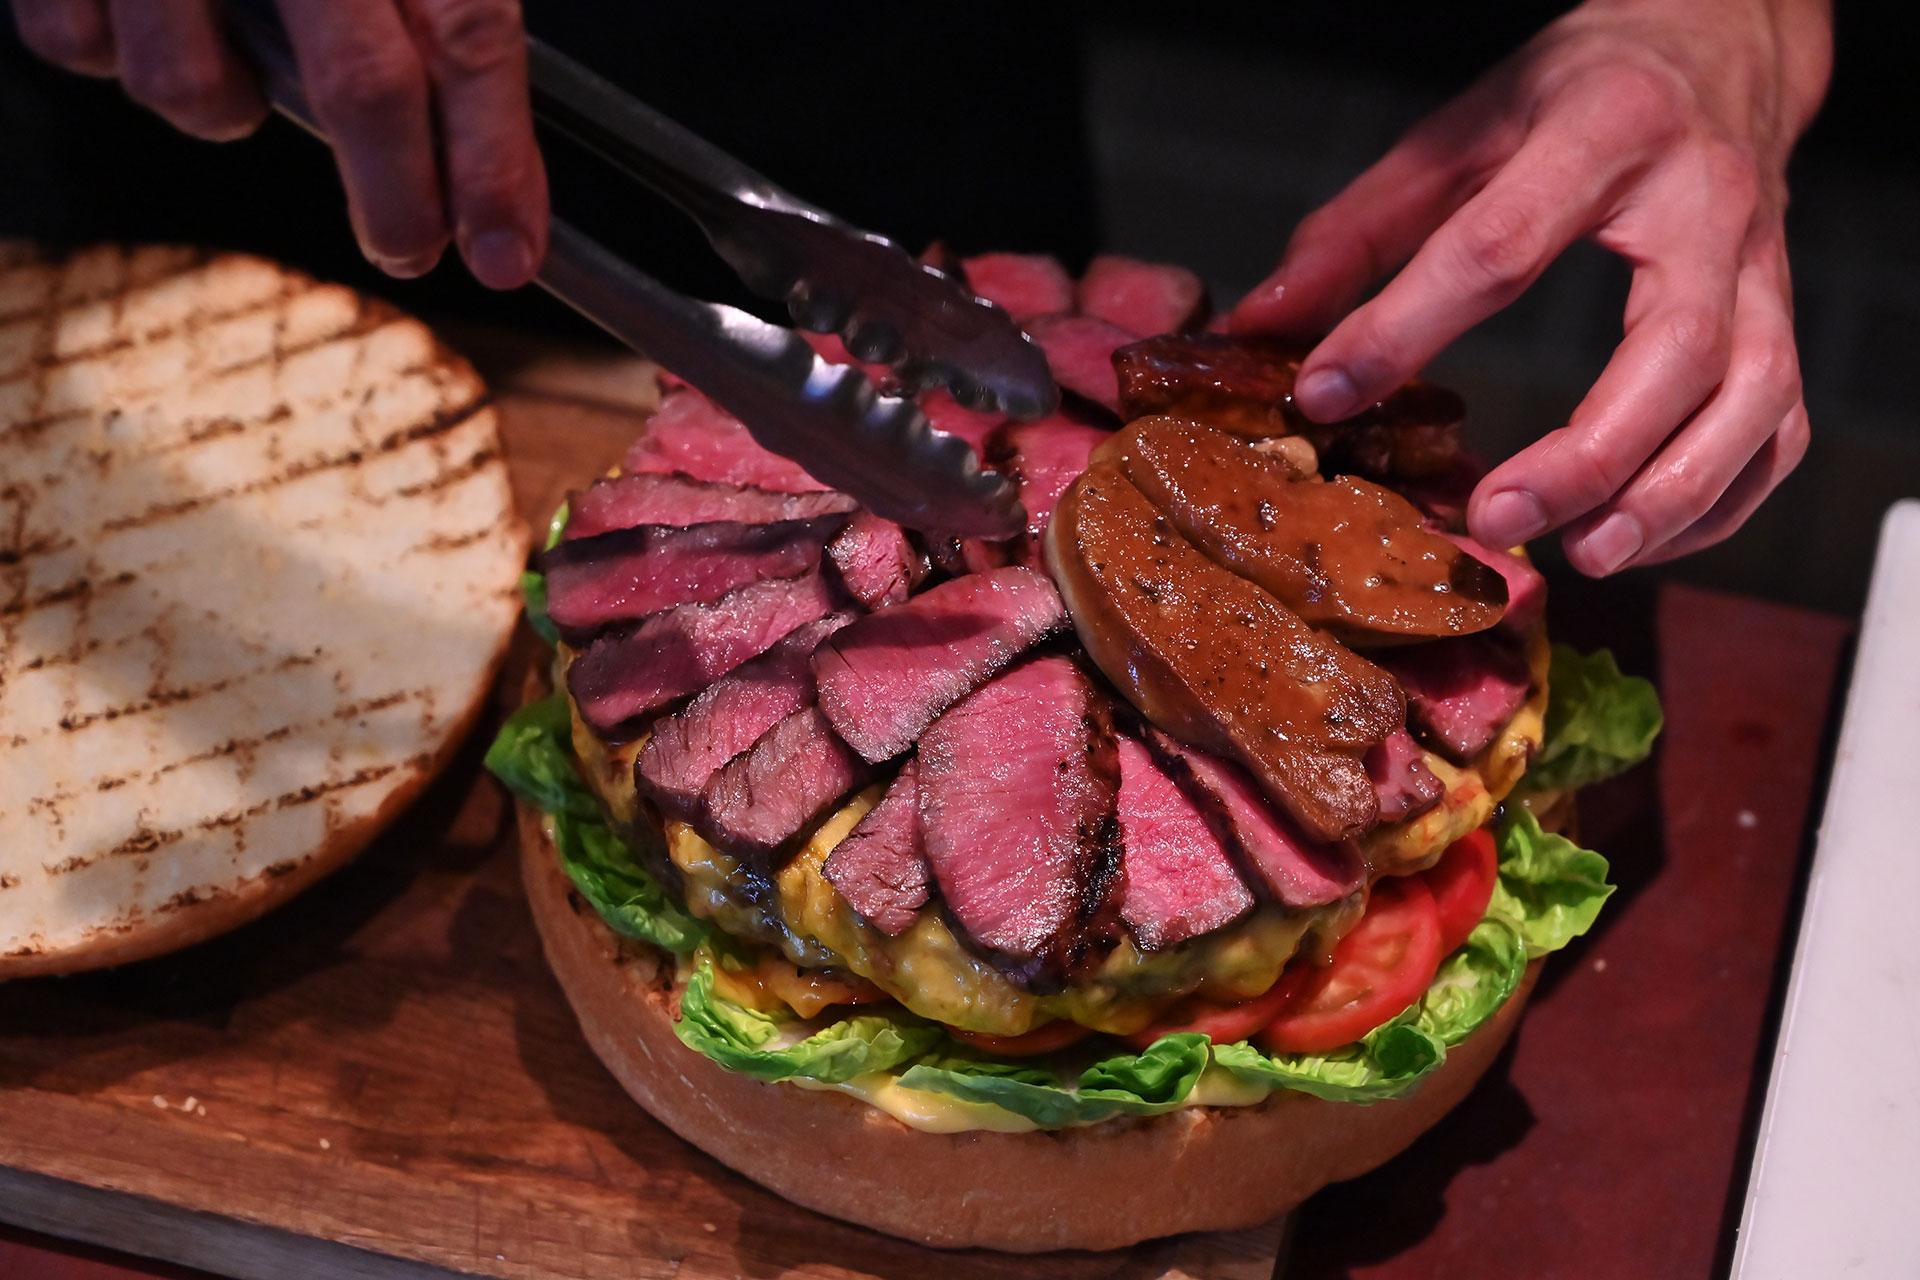 Shimada coloca las láminas de carne sobre la hamburguesa